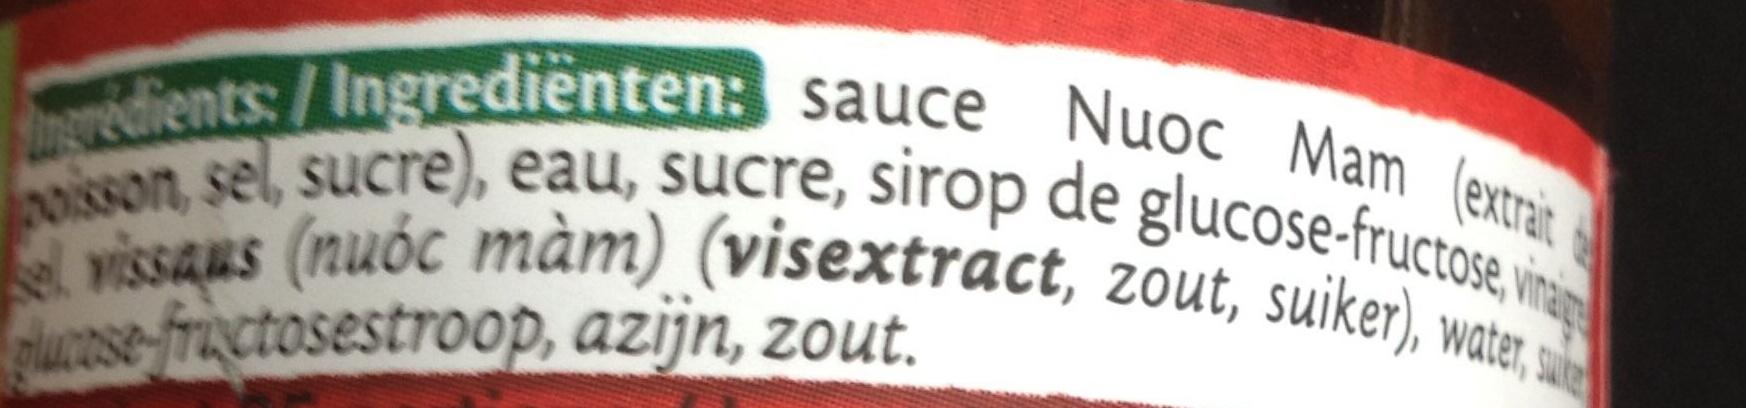 Sauce pour nems - Ingrediënten